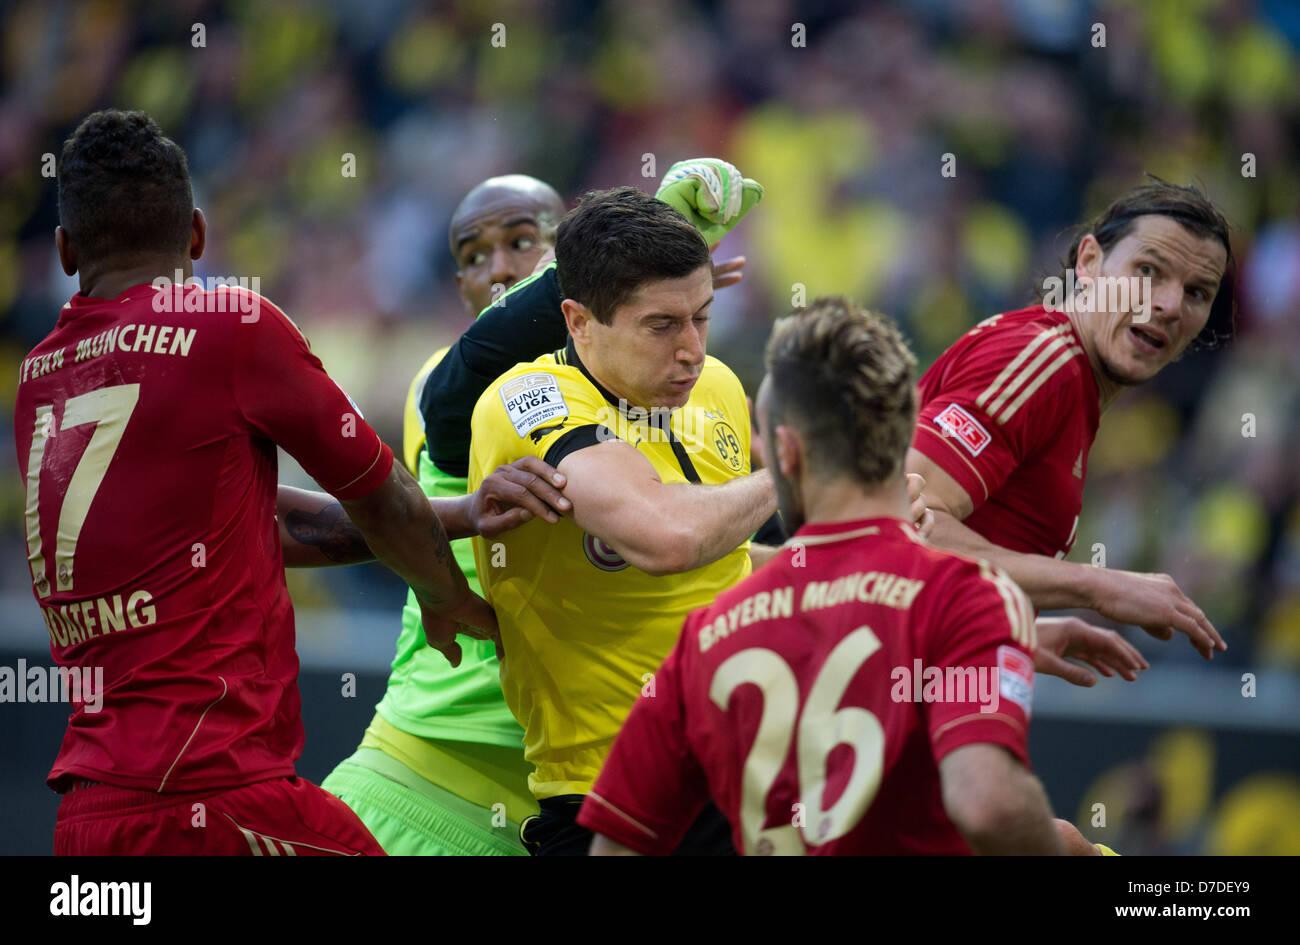 Dortmund Robert Lewandowski e Felipe Santana e Bayern di Jerome Boateng, custode Manuel Neuer, Diego contento e Immagini Stock